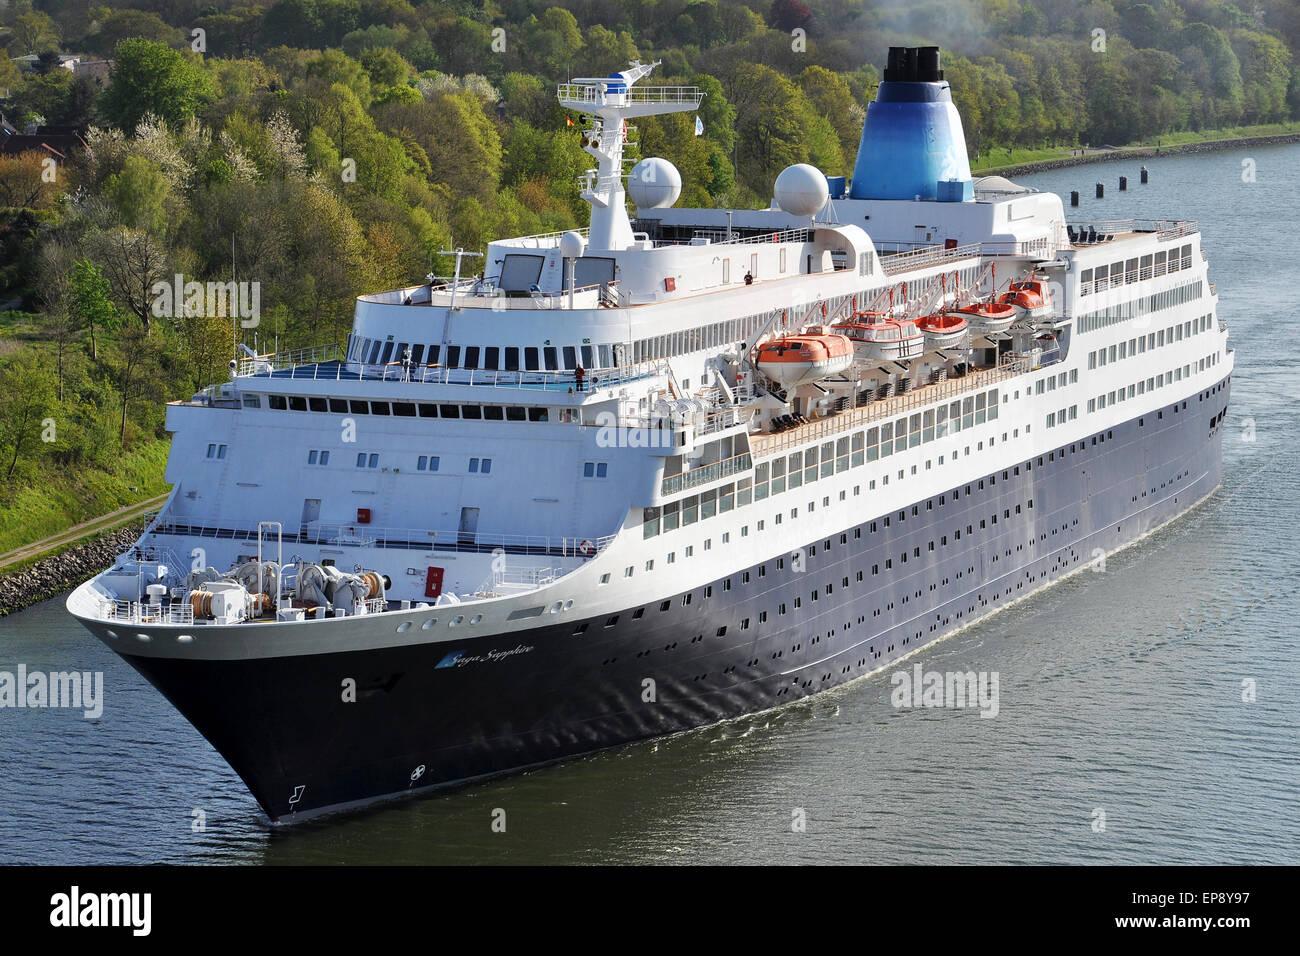 Cruiseship Saga Sapphire passing the Kiel Canal - Stock Image